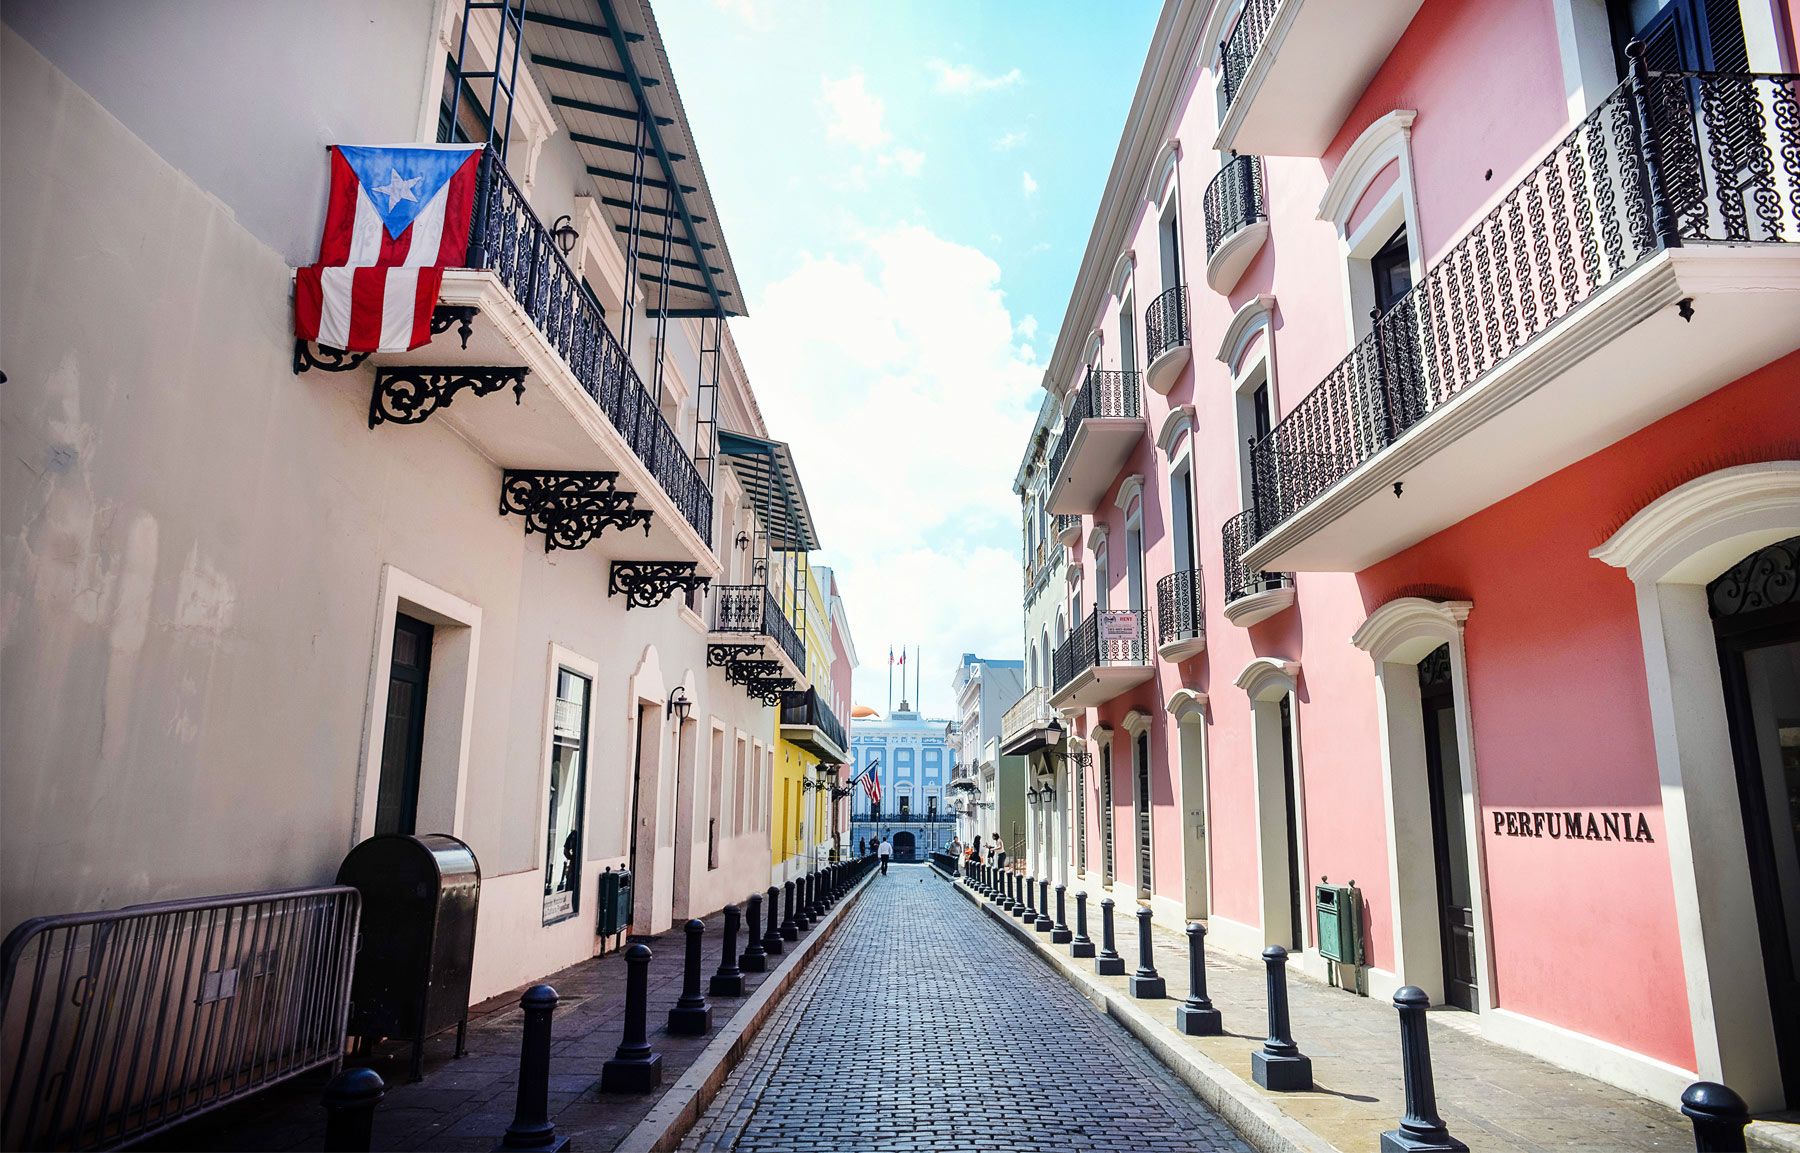 01-Puerto-Rico-Wedding-Photography-by-Vick-Photography-Destination-Wedding-Island-Tropical-Paradise-Chanel-and-Sam.jpg